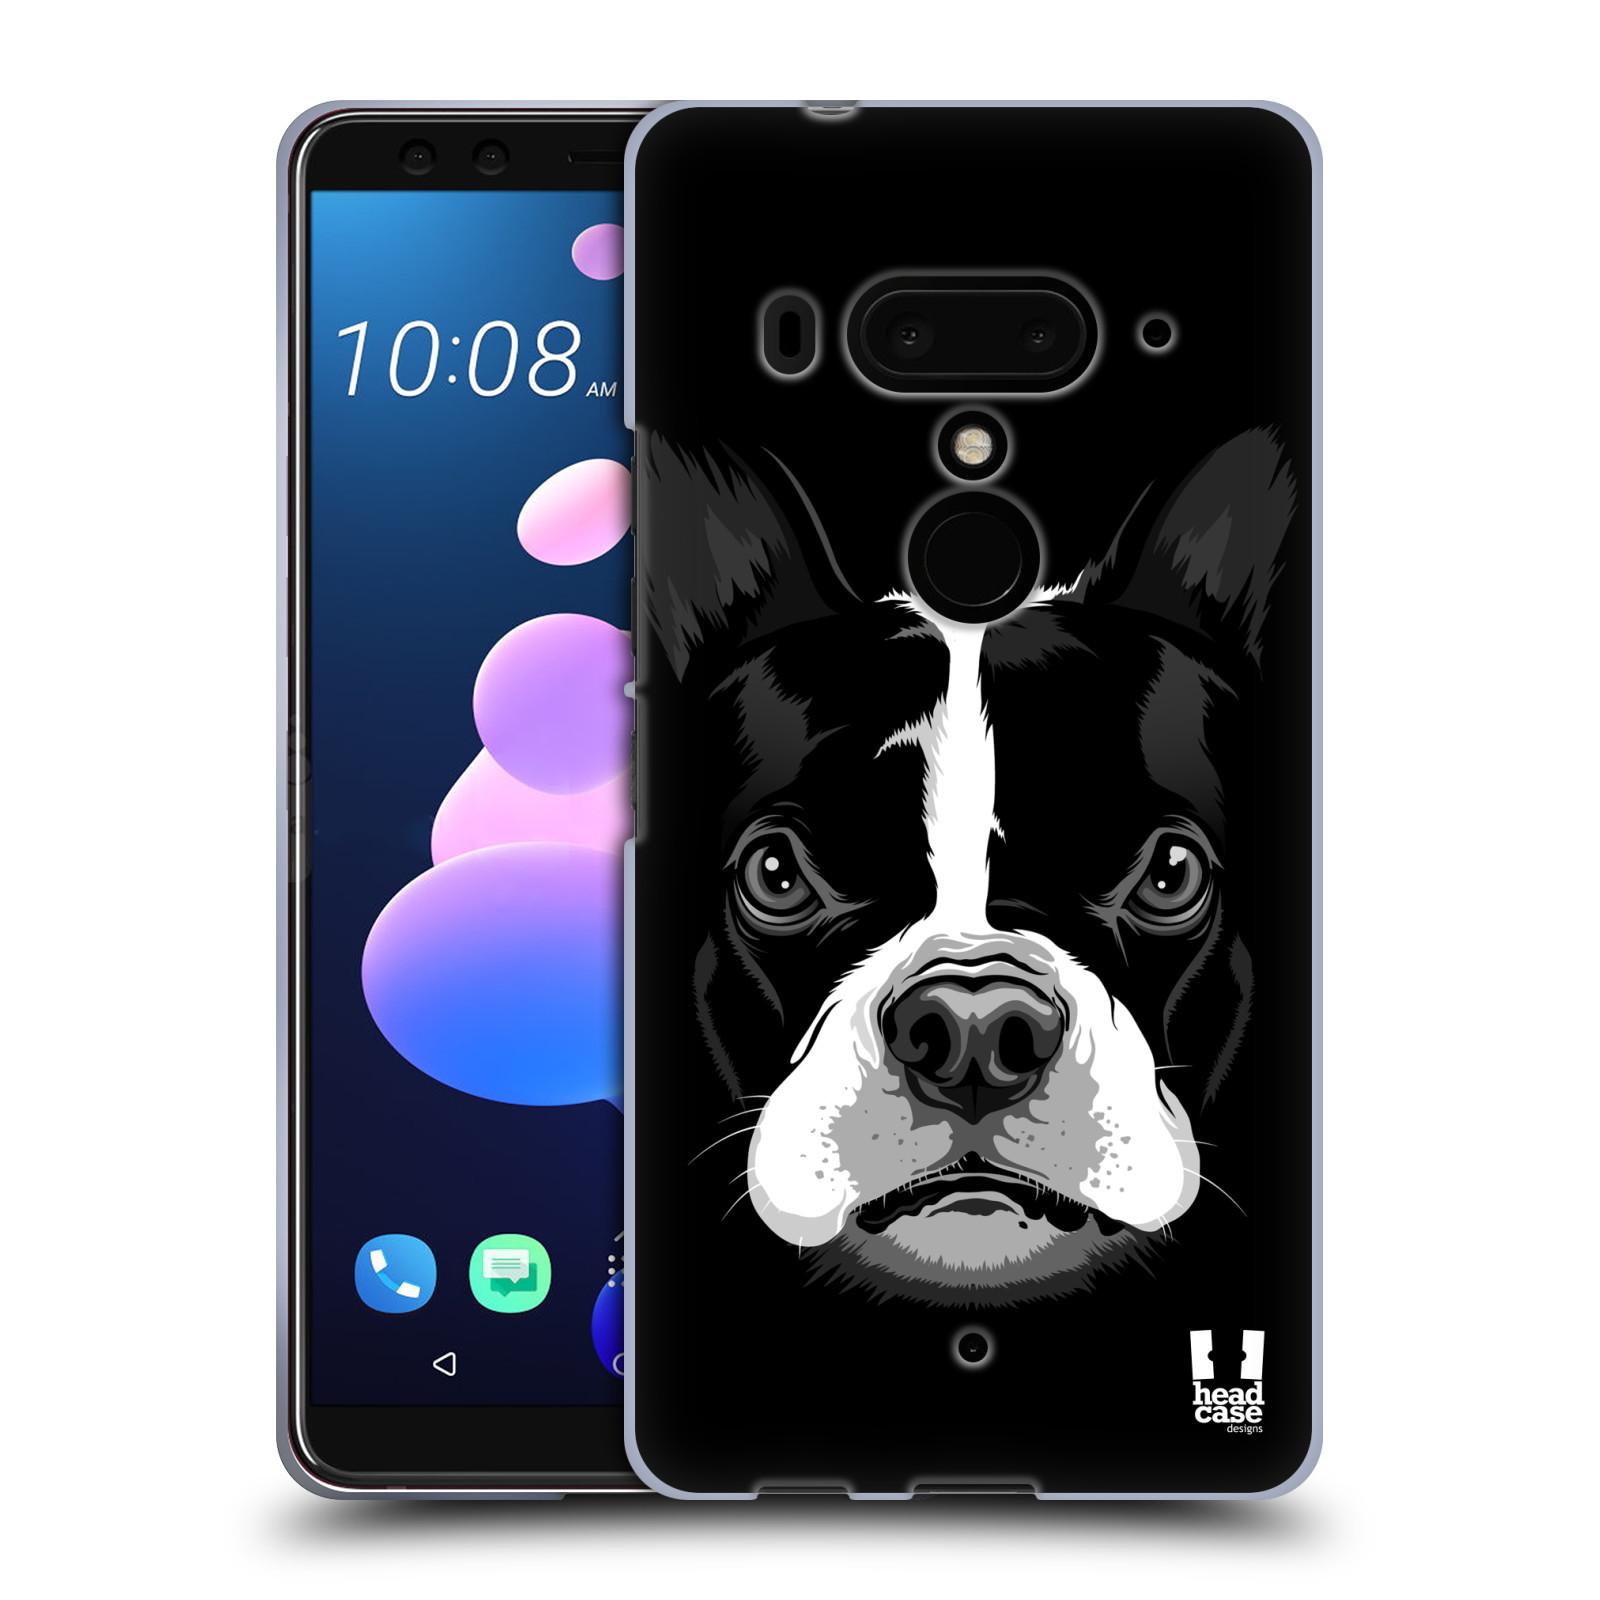 Silikonové pouzdro na mobil HTC U12 Plus - Head Case - ILUSTROVANÝ BULDOČEK